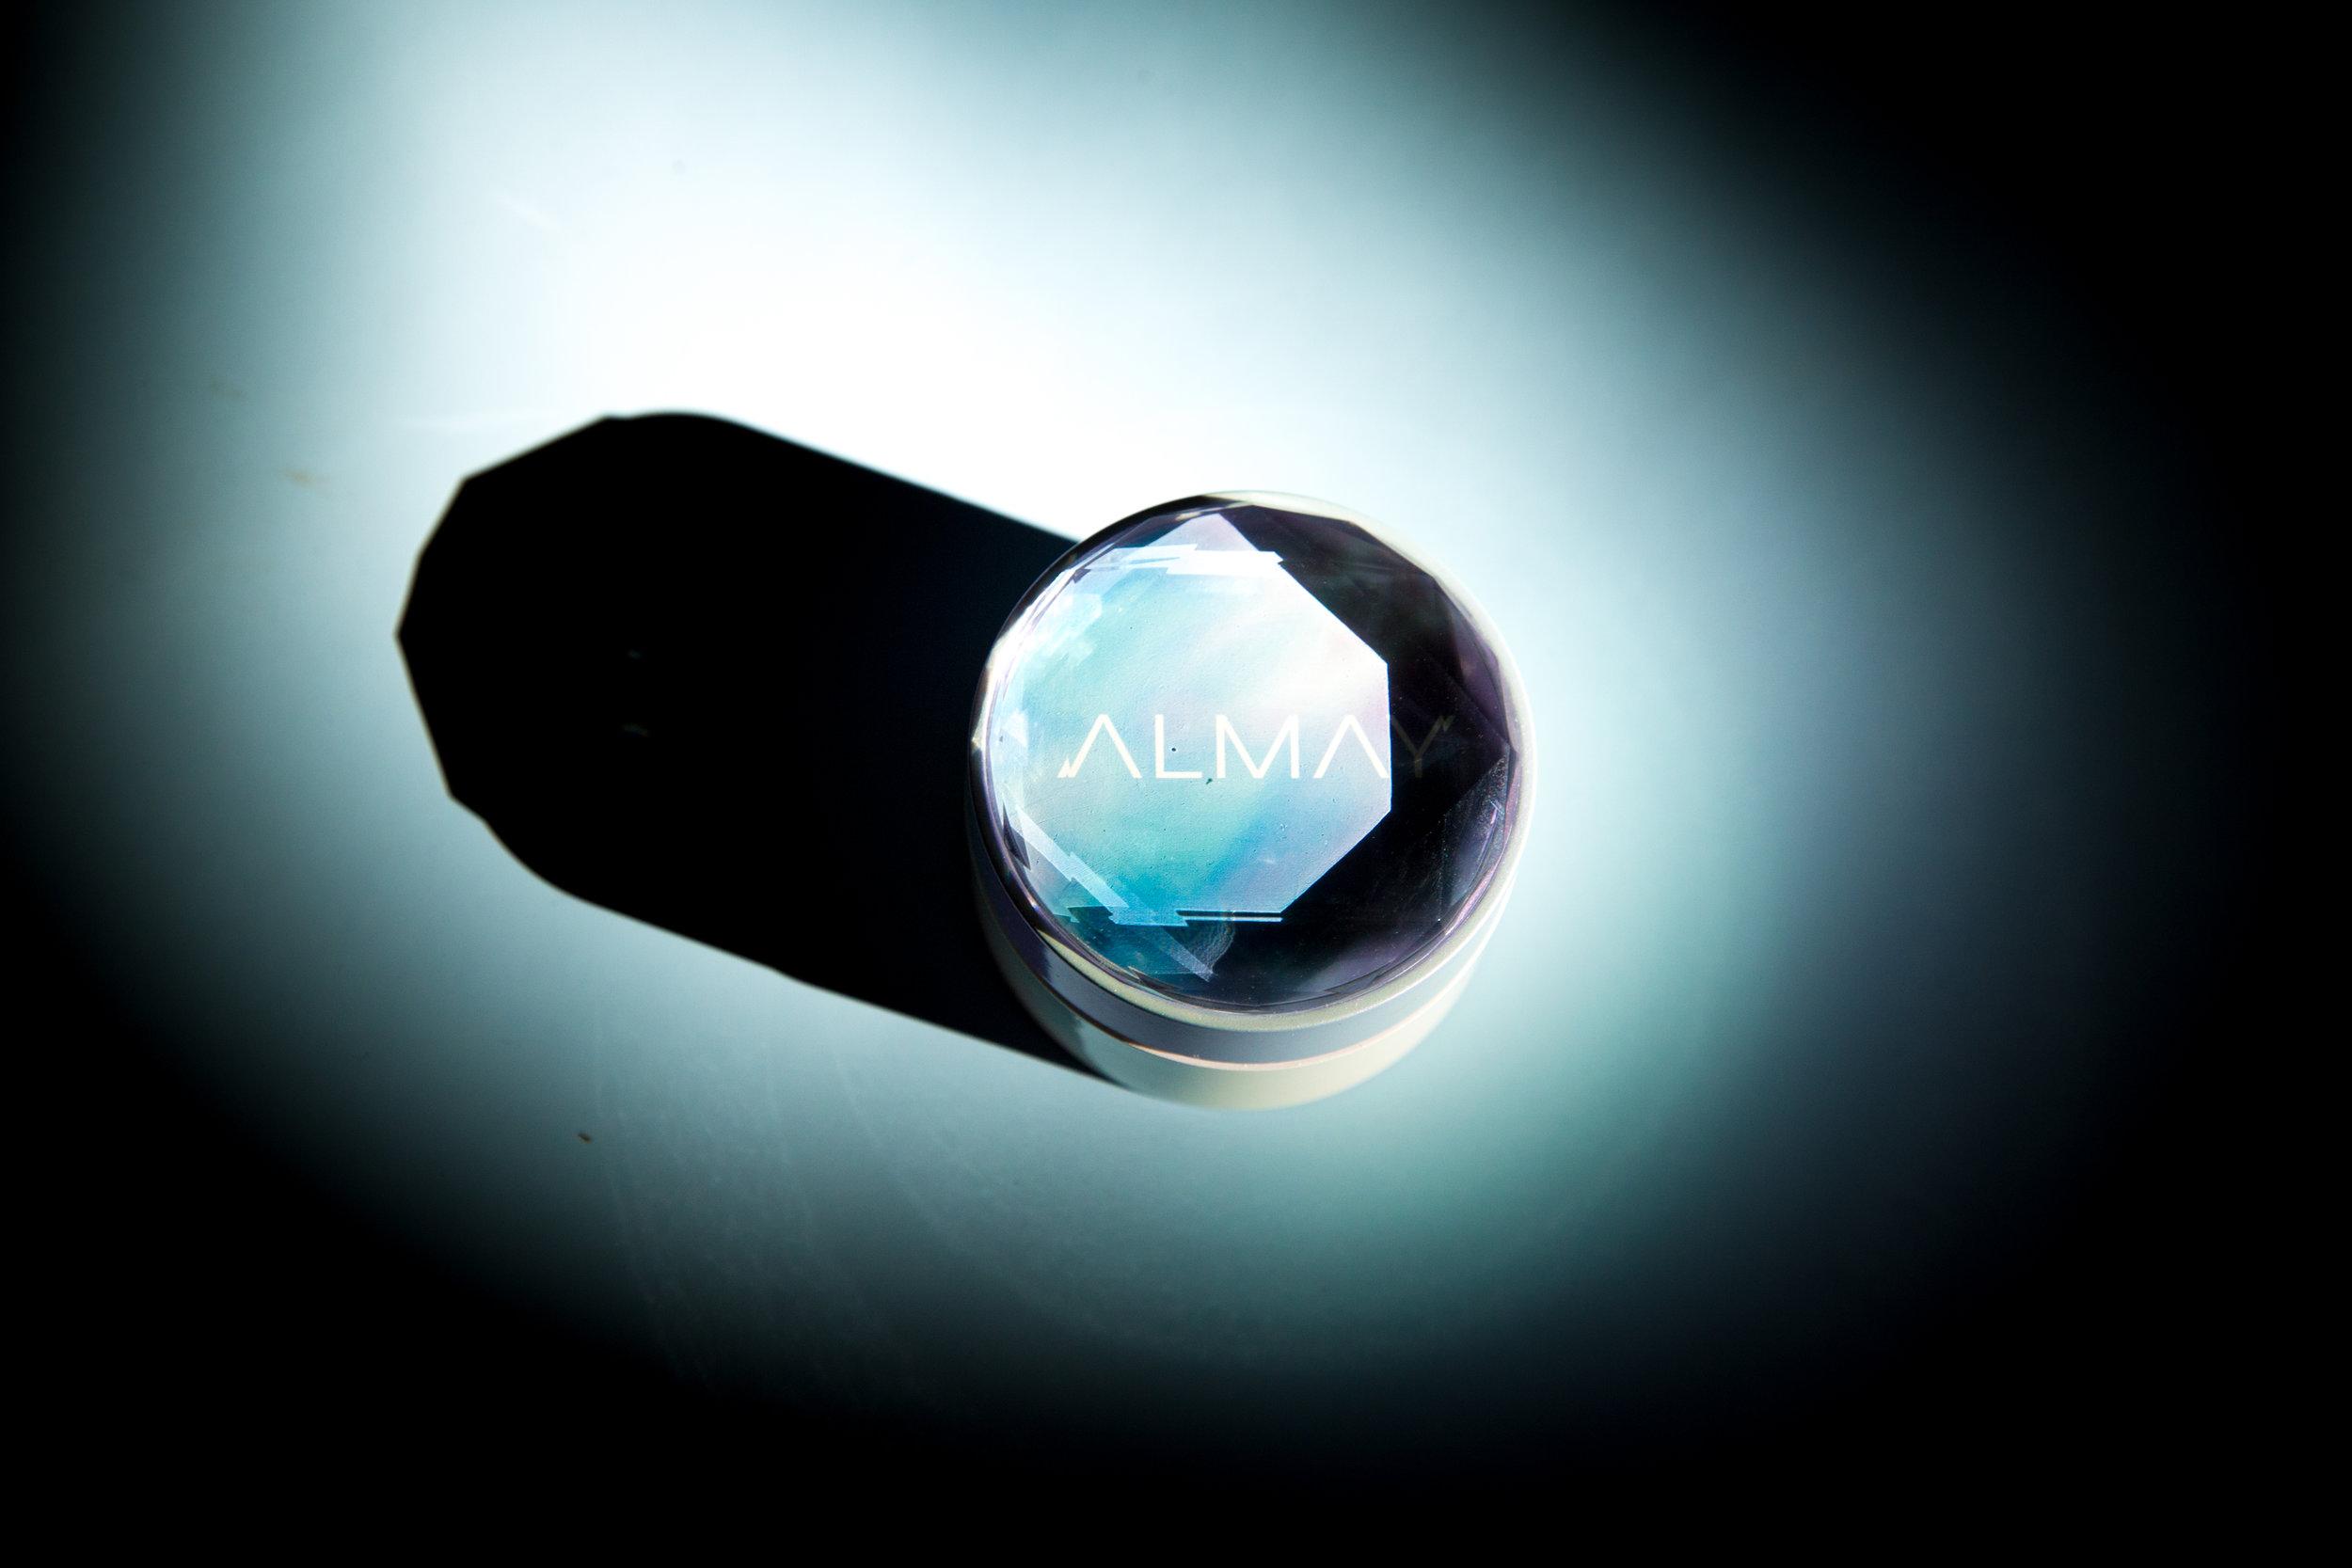 171108 SKM - ALMAY-100.jpg